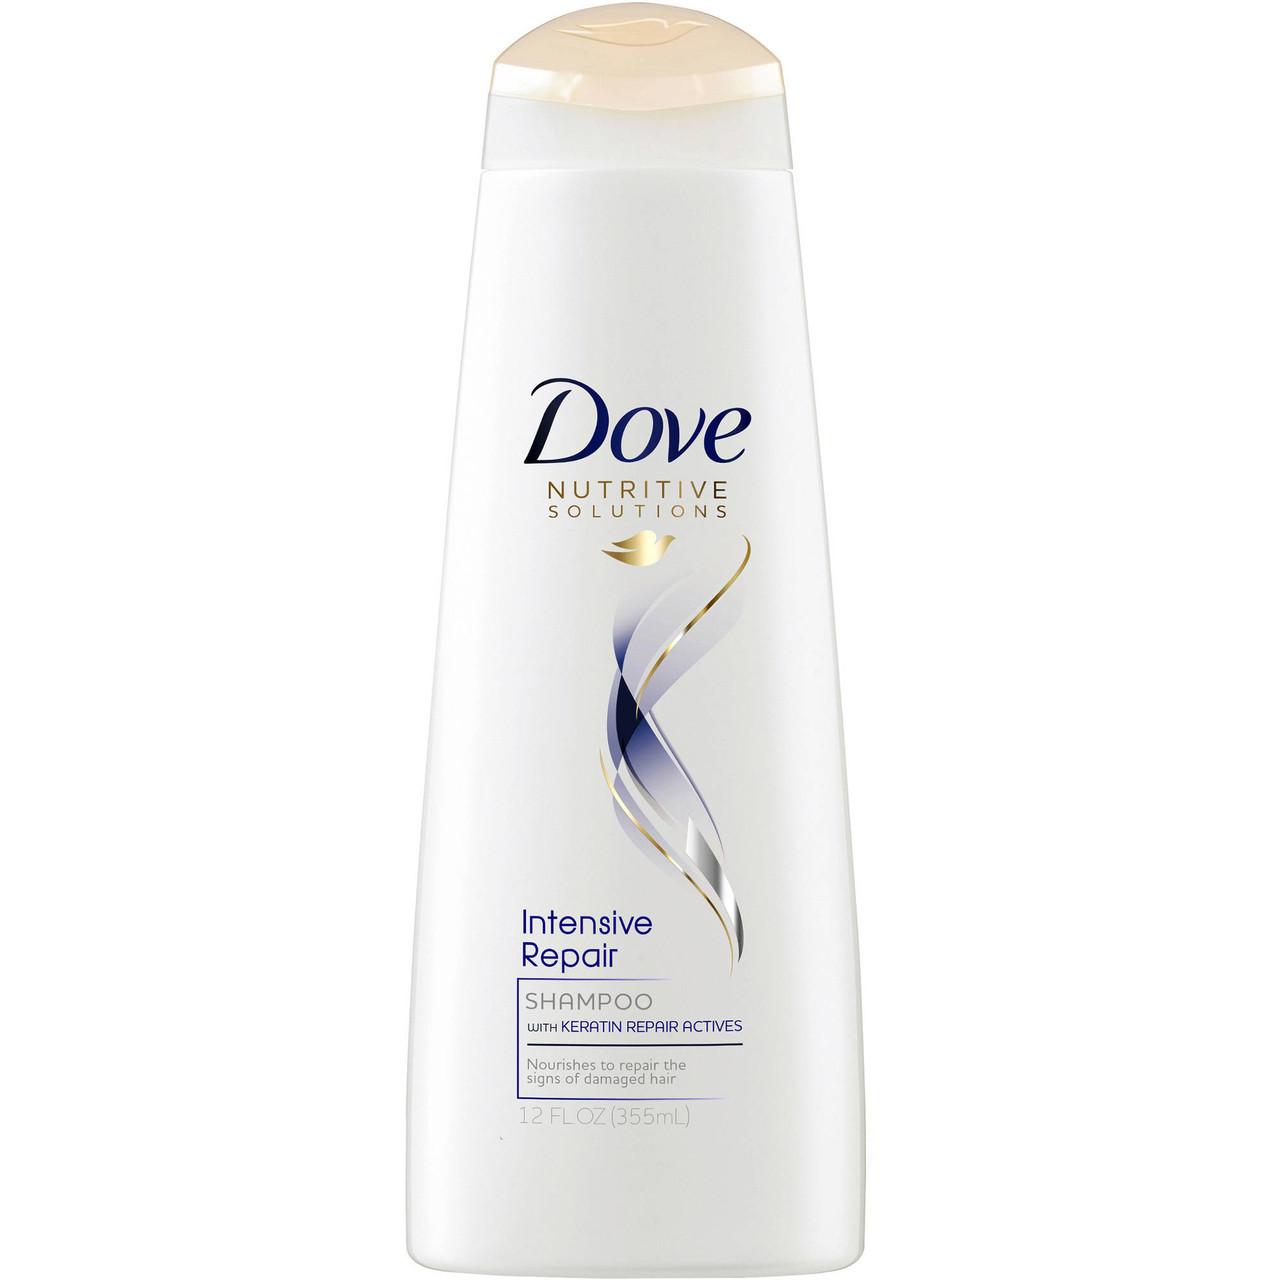 Шампунь для волосся Dove Intensive Repair 400 ml.